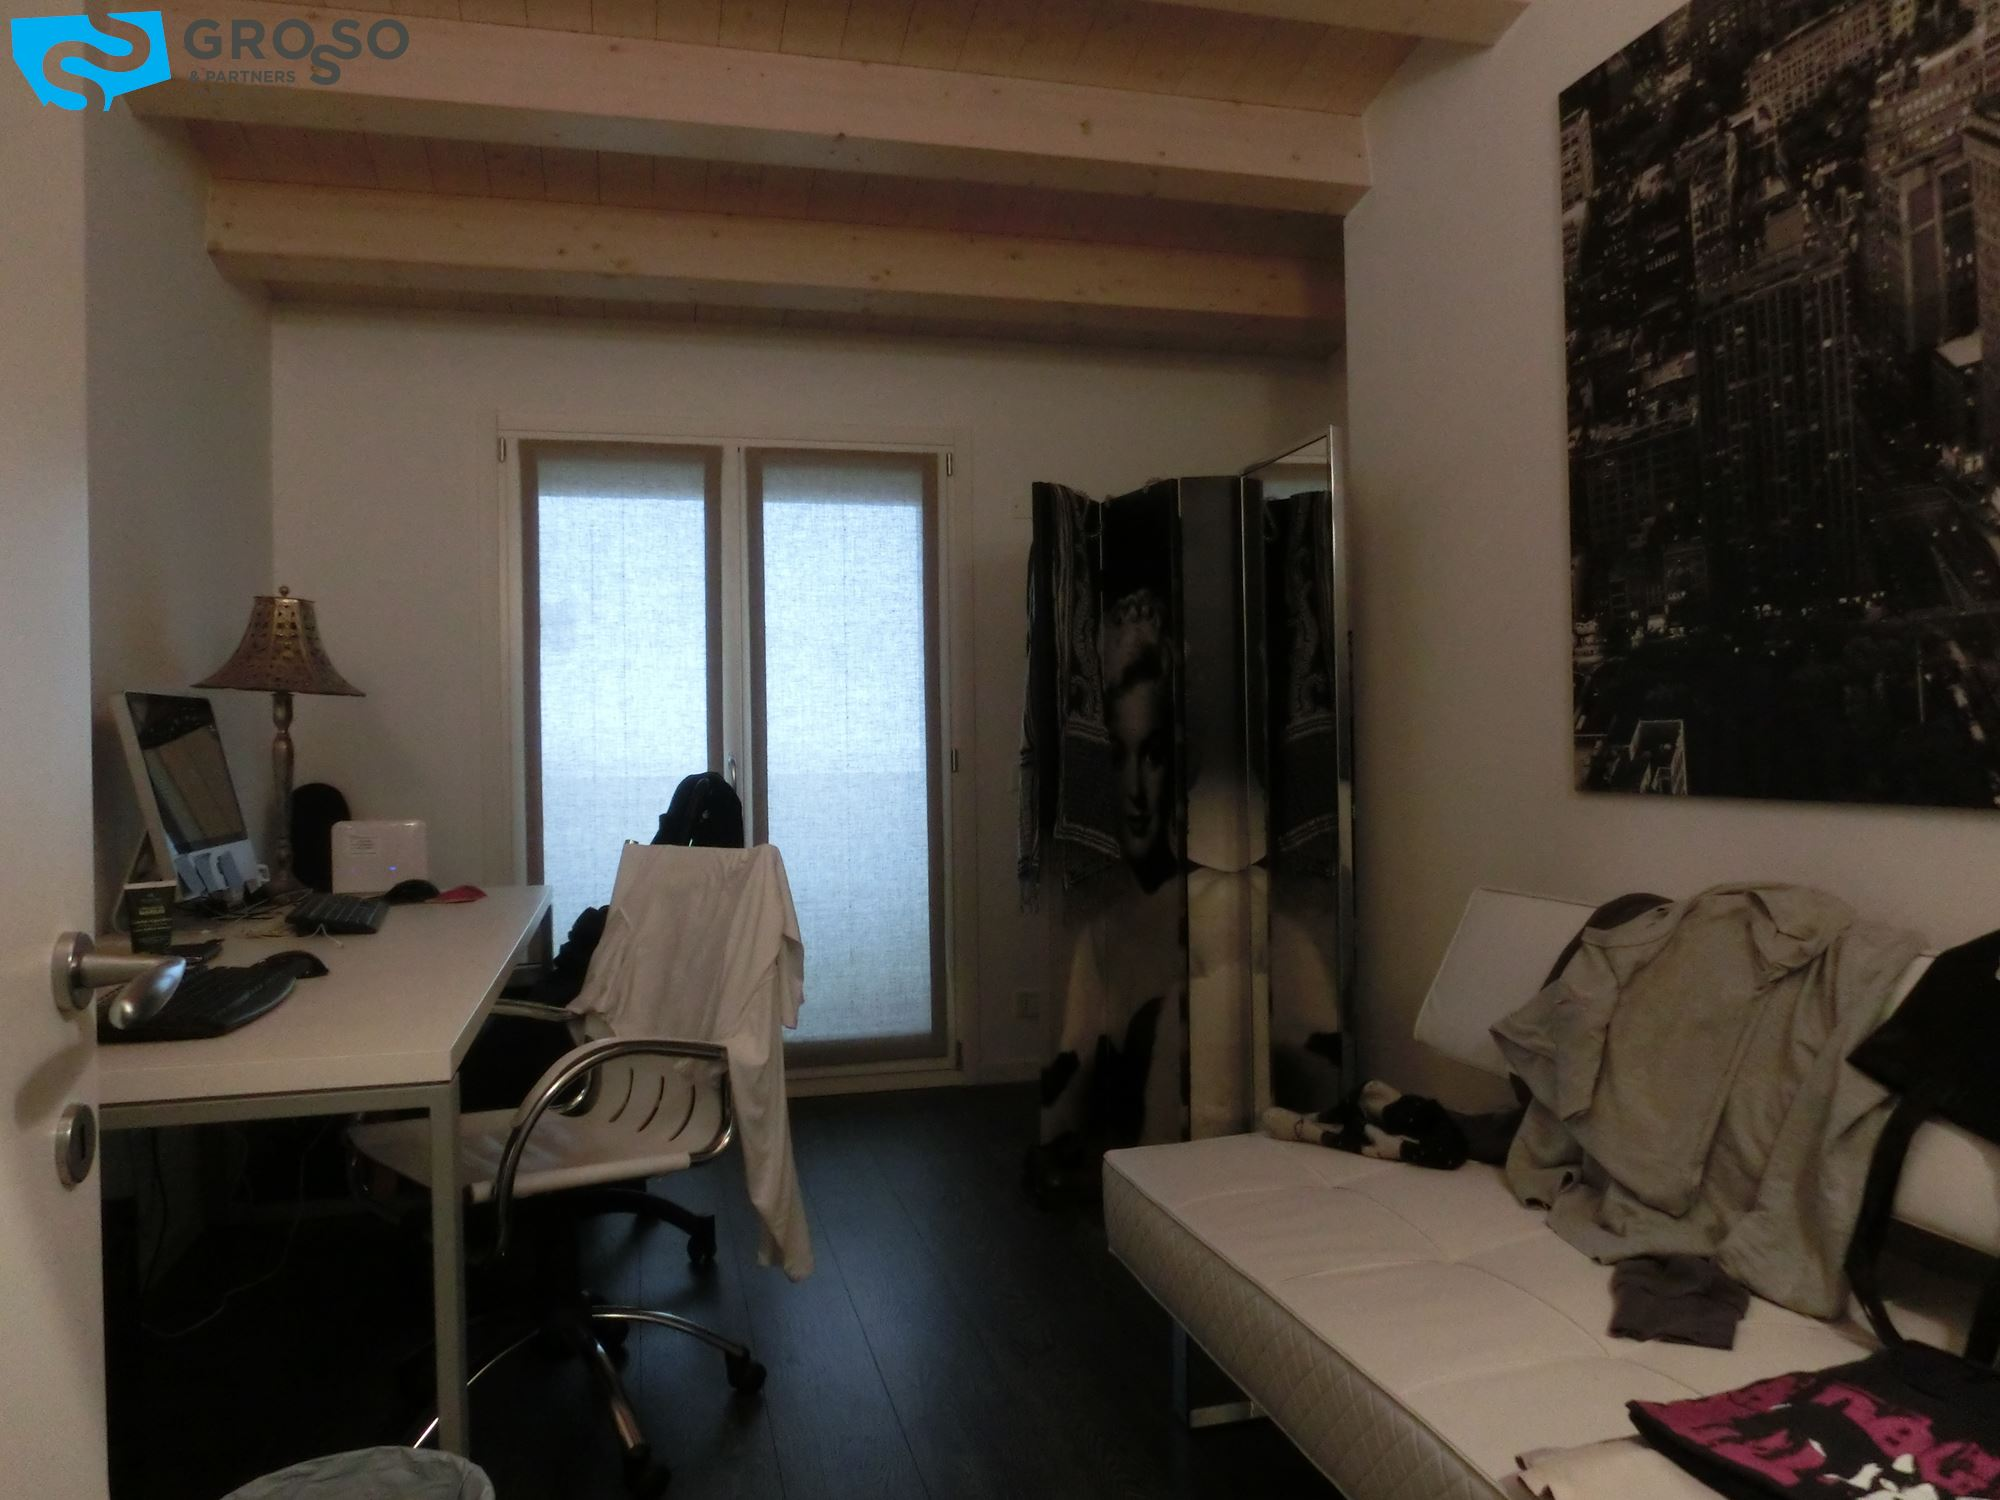 ... Mansarde Ponzano Veneto - Grosso & Partners  Real Estate Treviso